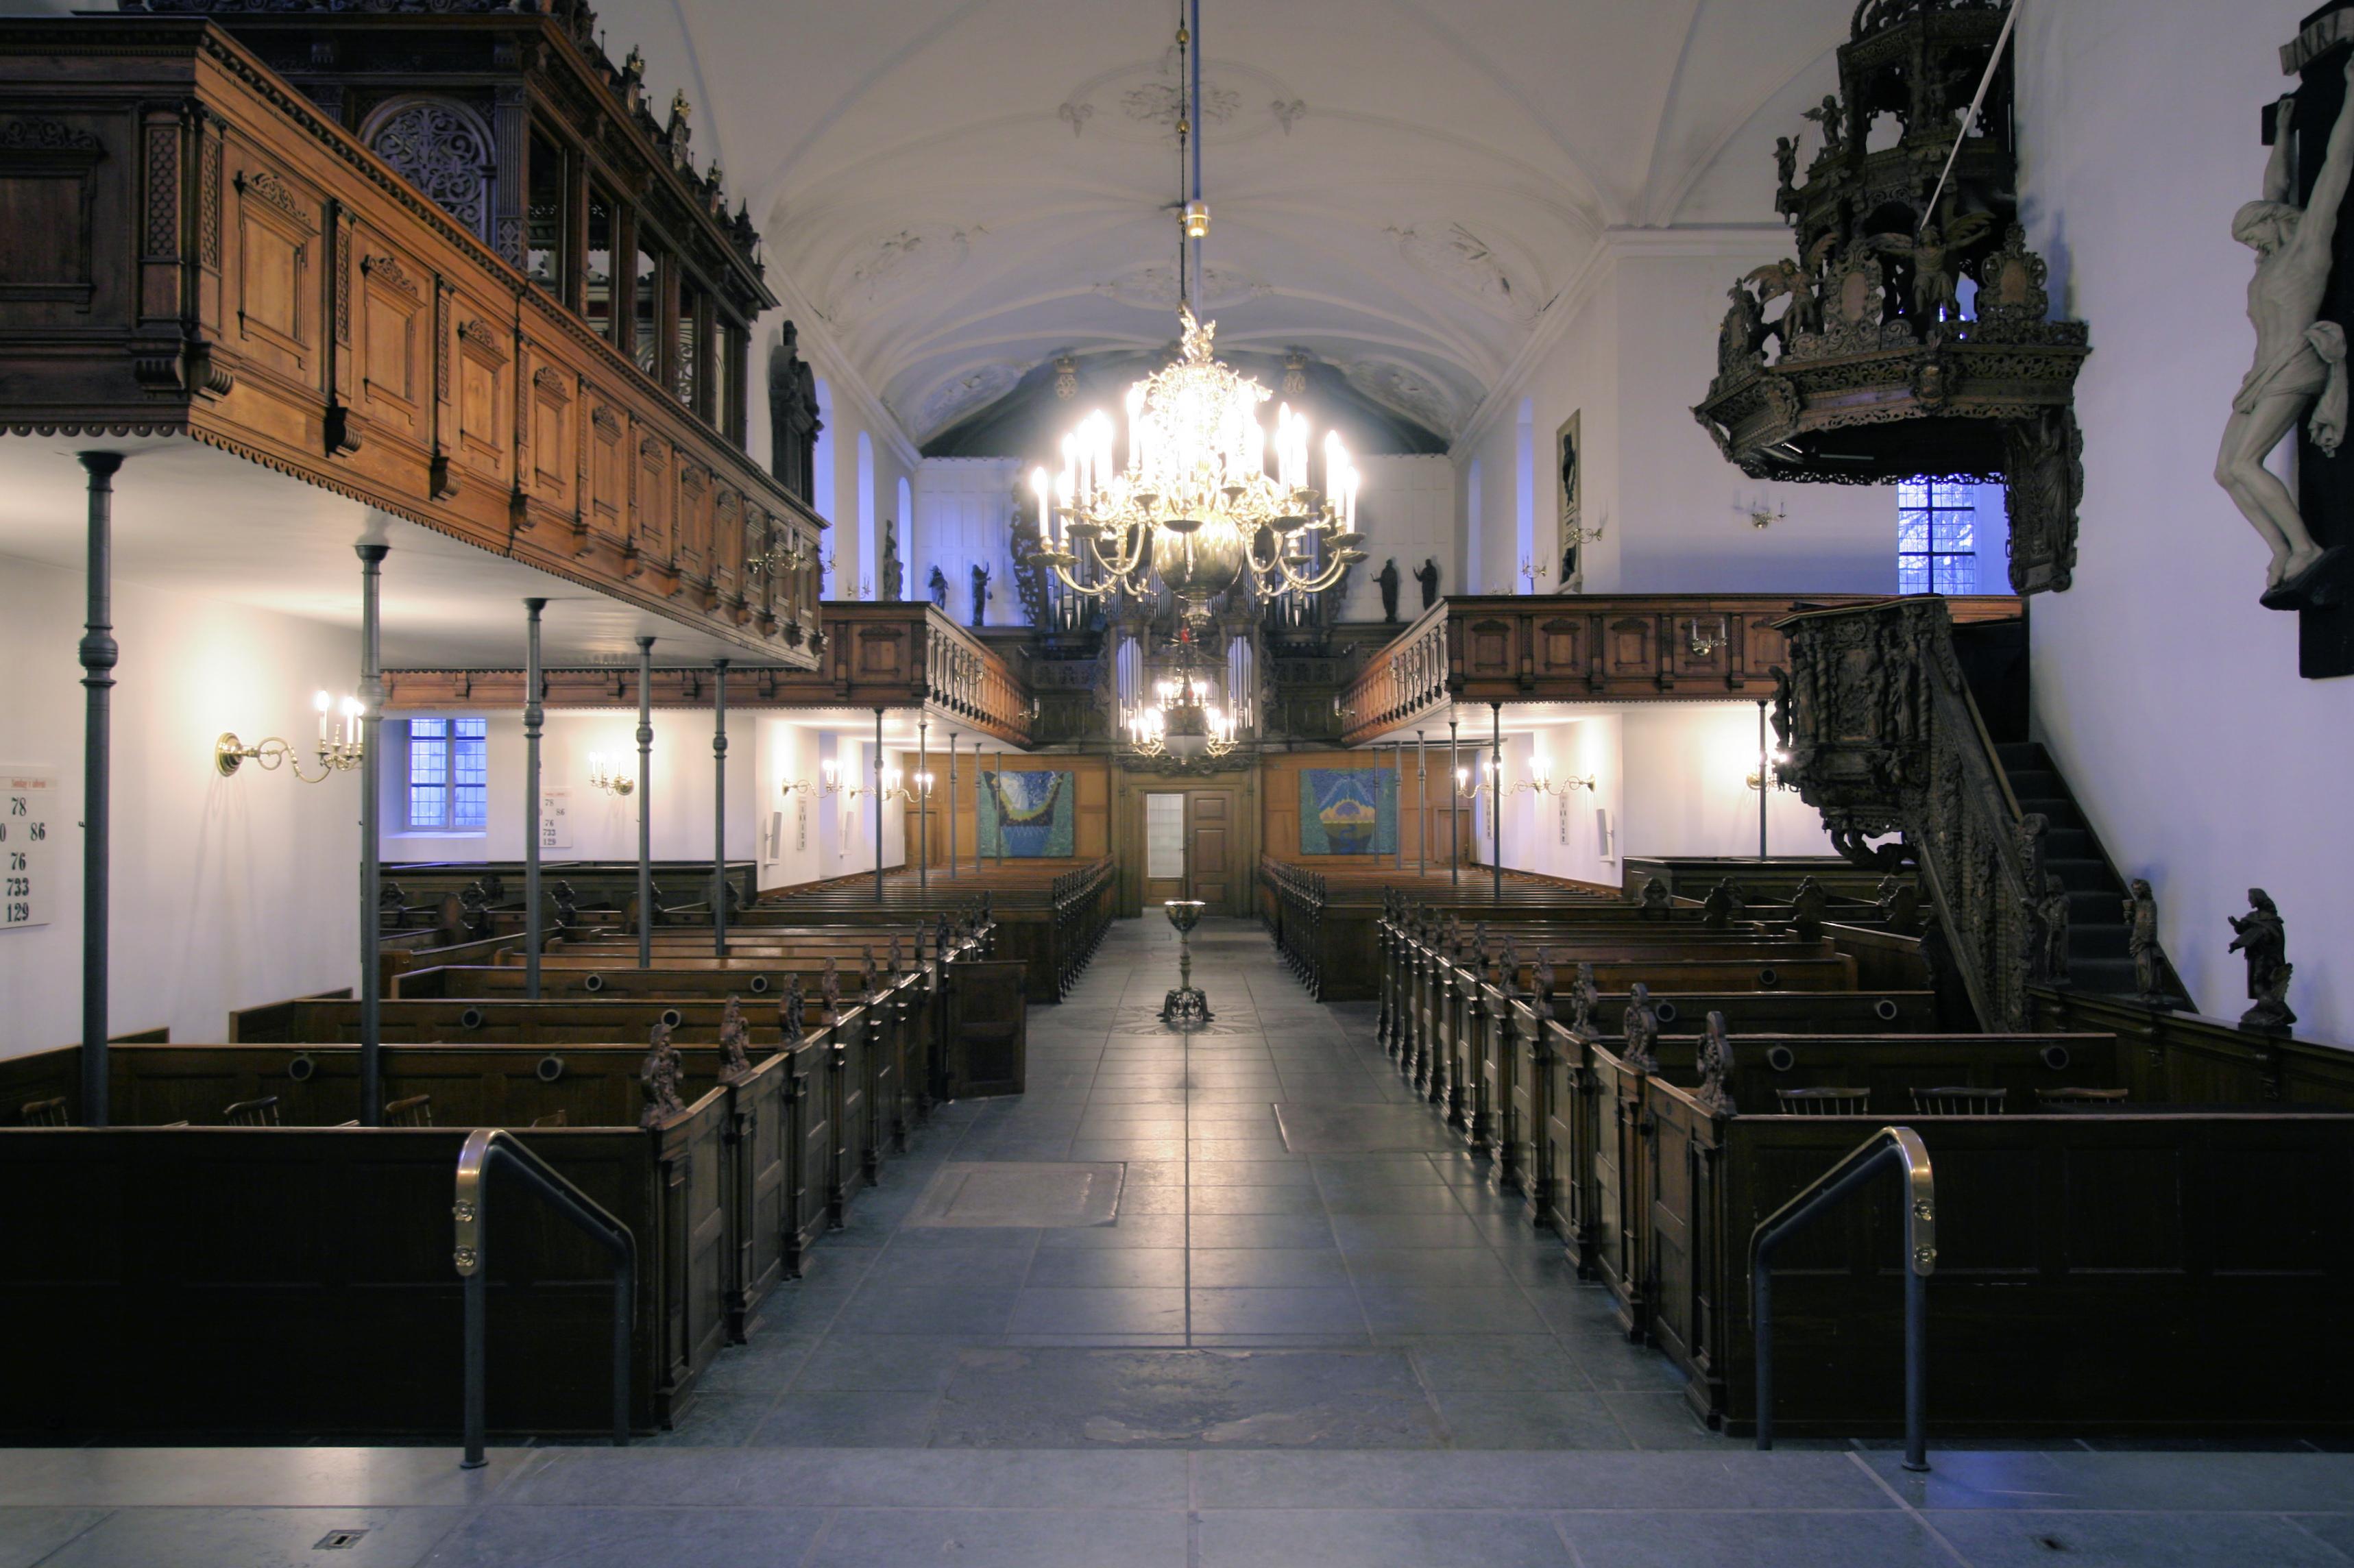 File:Holmens Kirke Copenhagen interior from altar.jpg - Wikimedia Commons